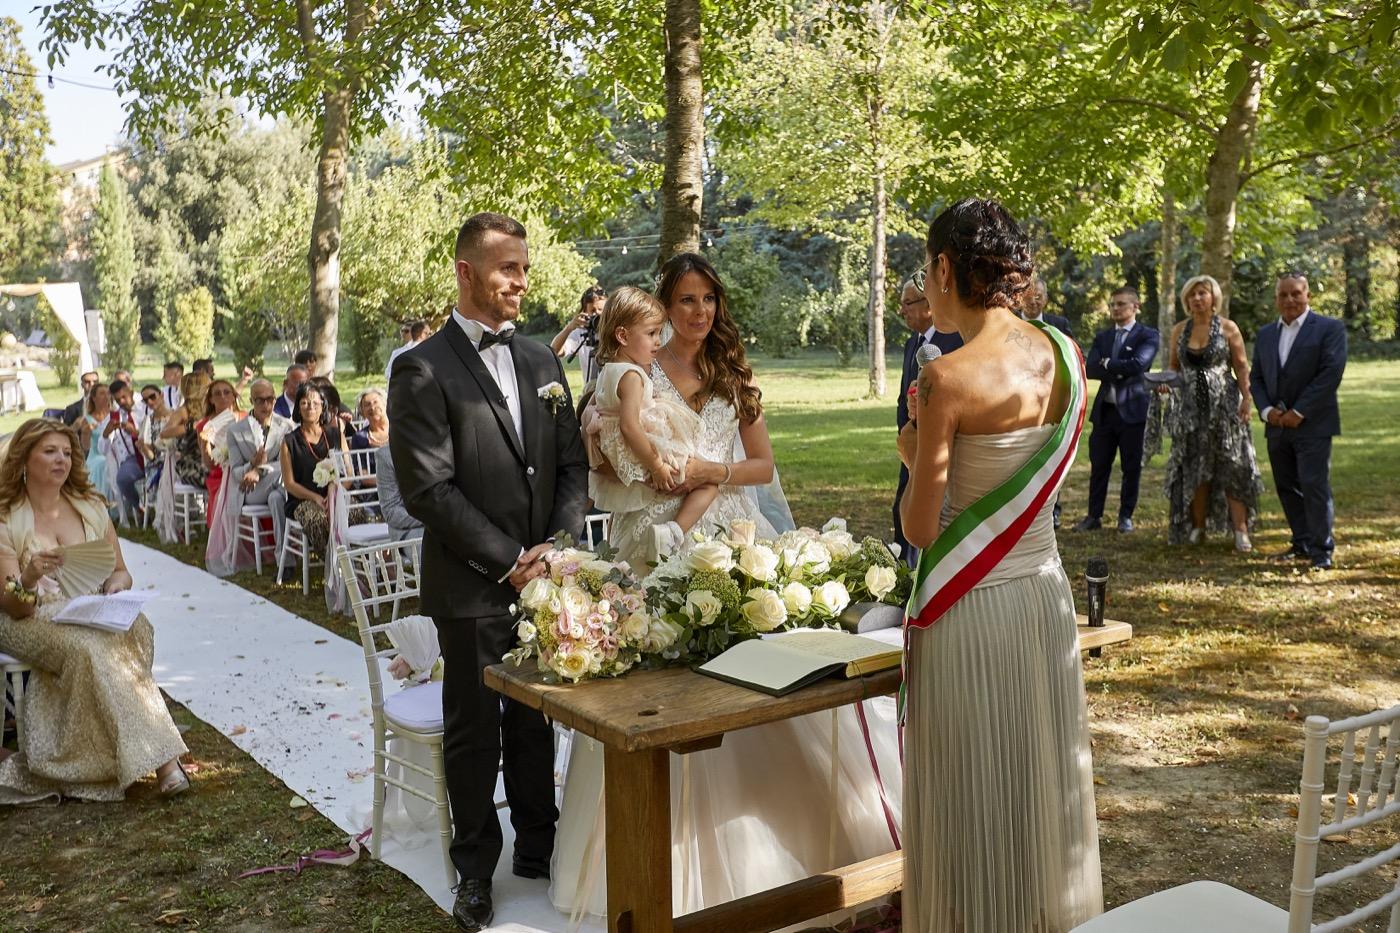 Claudio-Coppola-wedding-photographer-la-scuderia-eventi-preparativi-la-rosetta-perugia-50